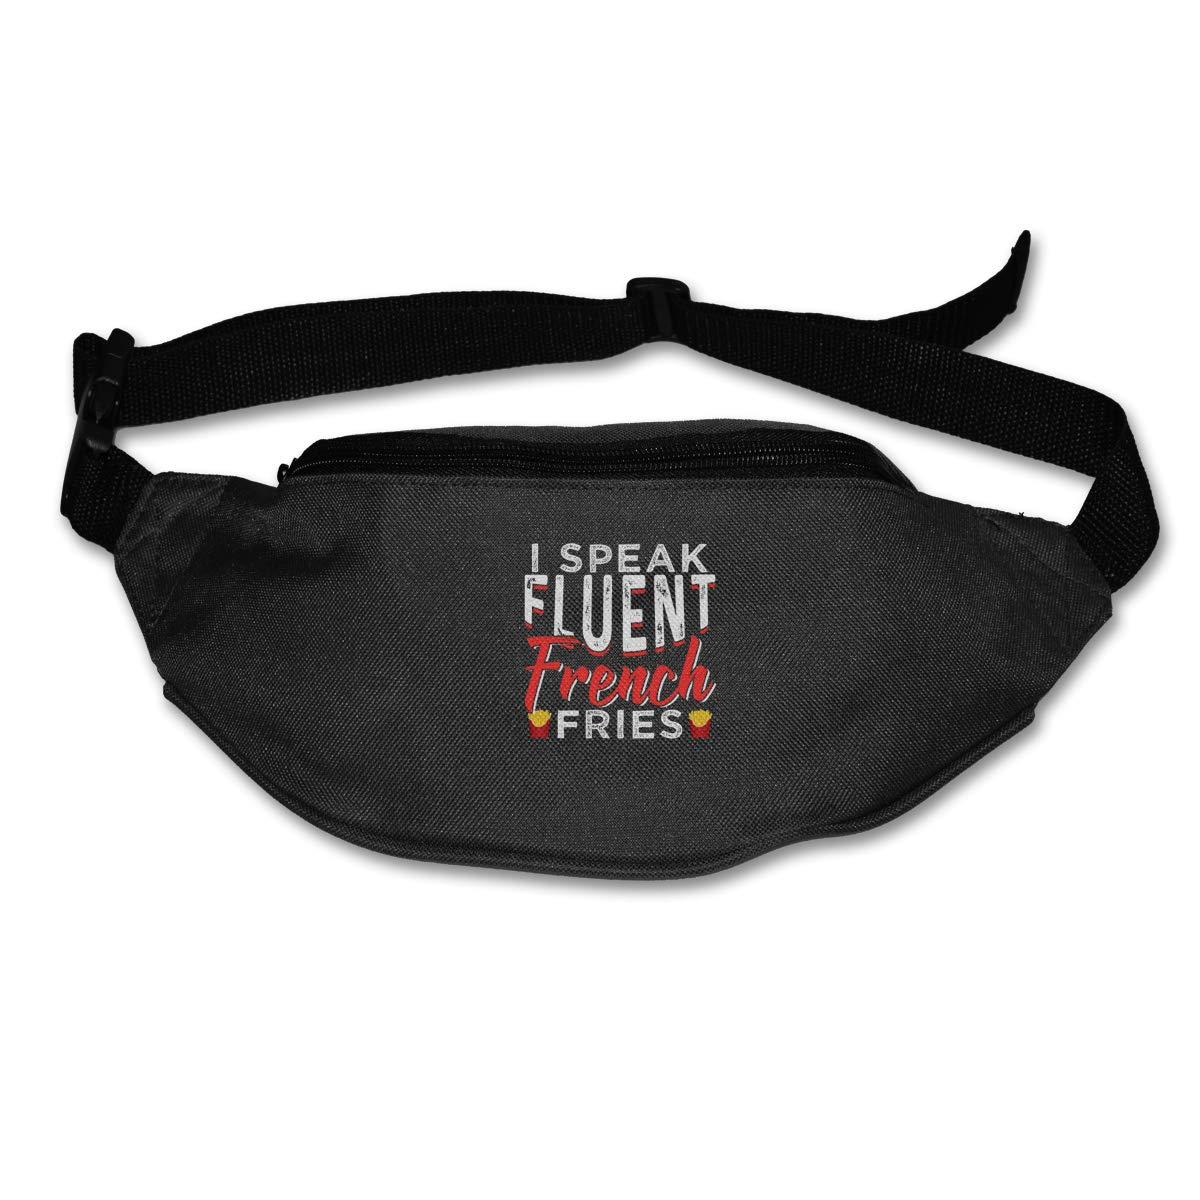 I Speak French Fries Sport Waist Bag Fanny Pack Adjustable For Travel